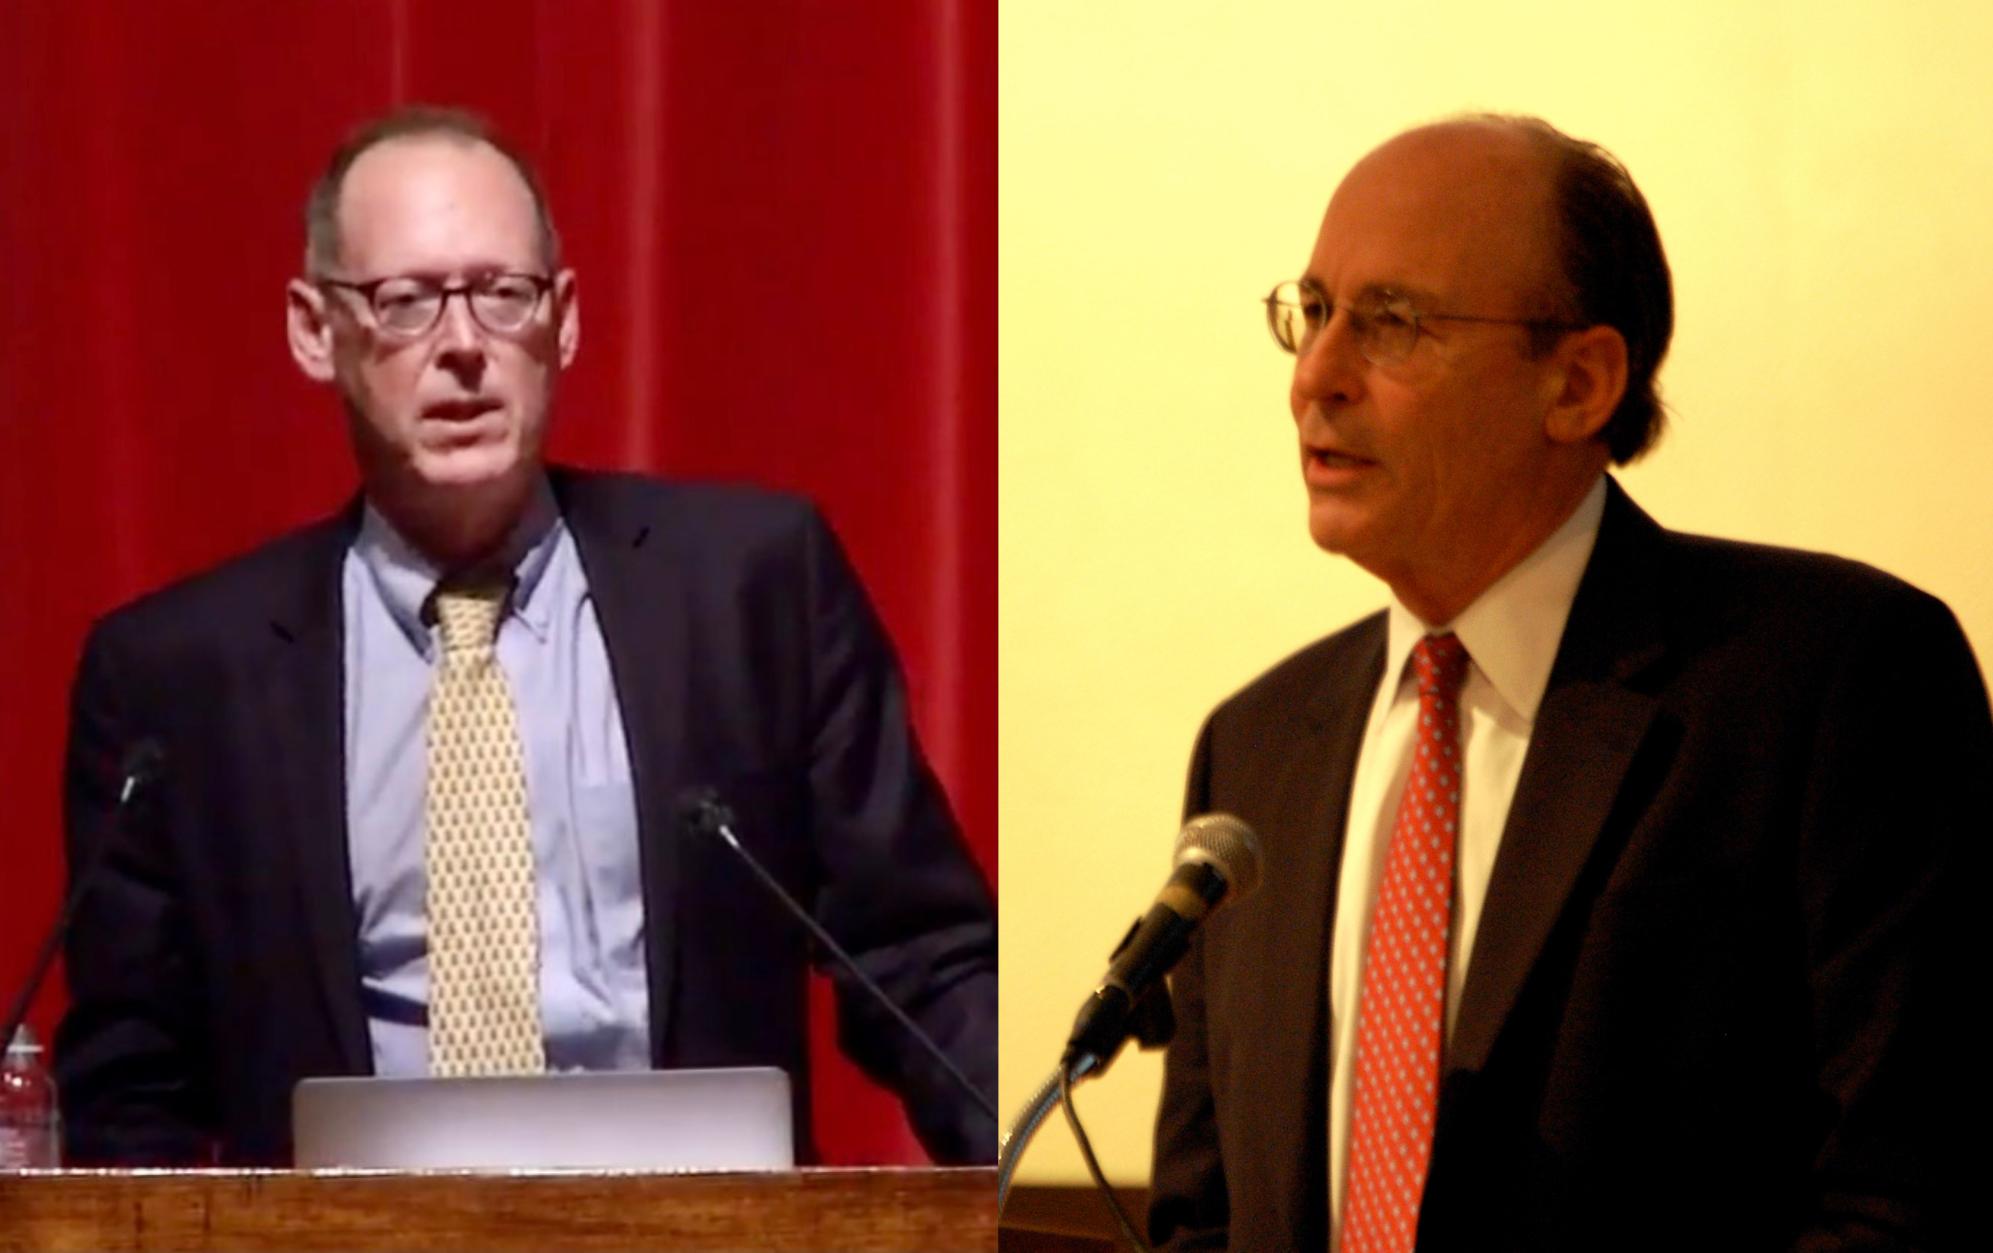 left: photograph of Paul Farmer; right: photograph of Tracy Kidder